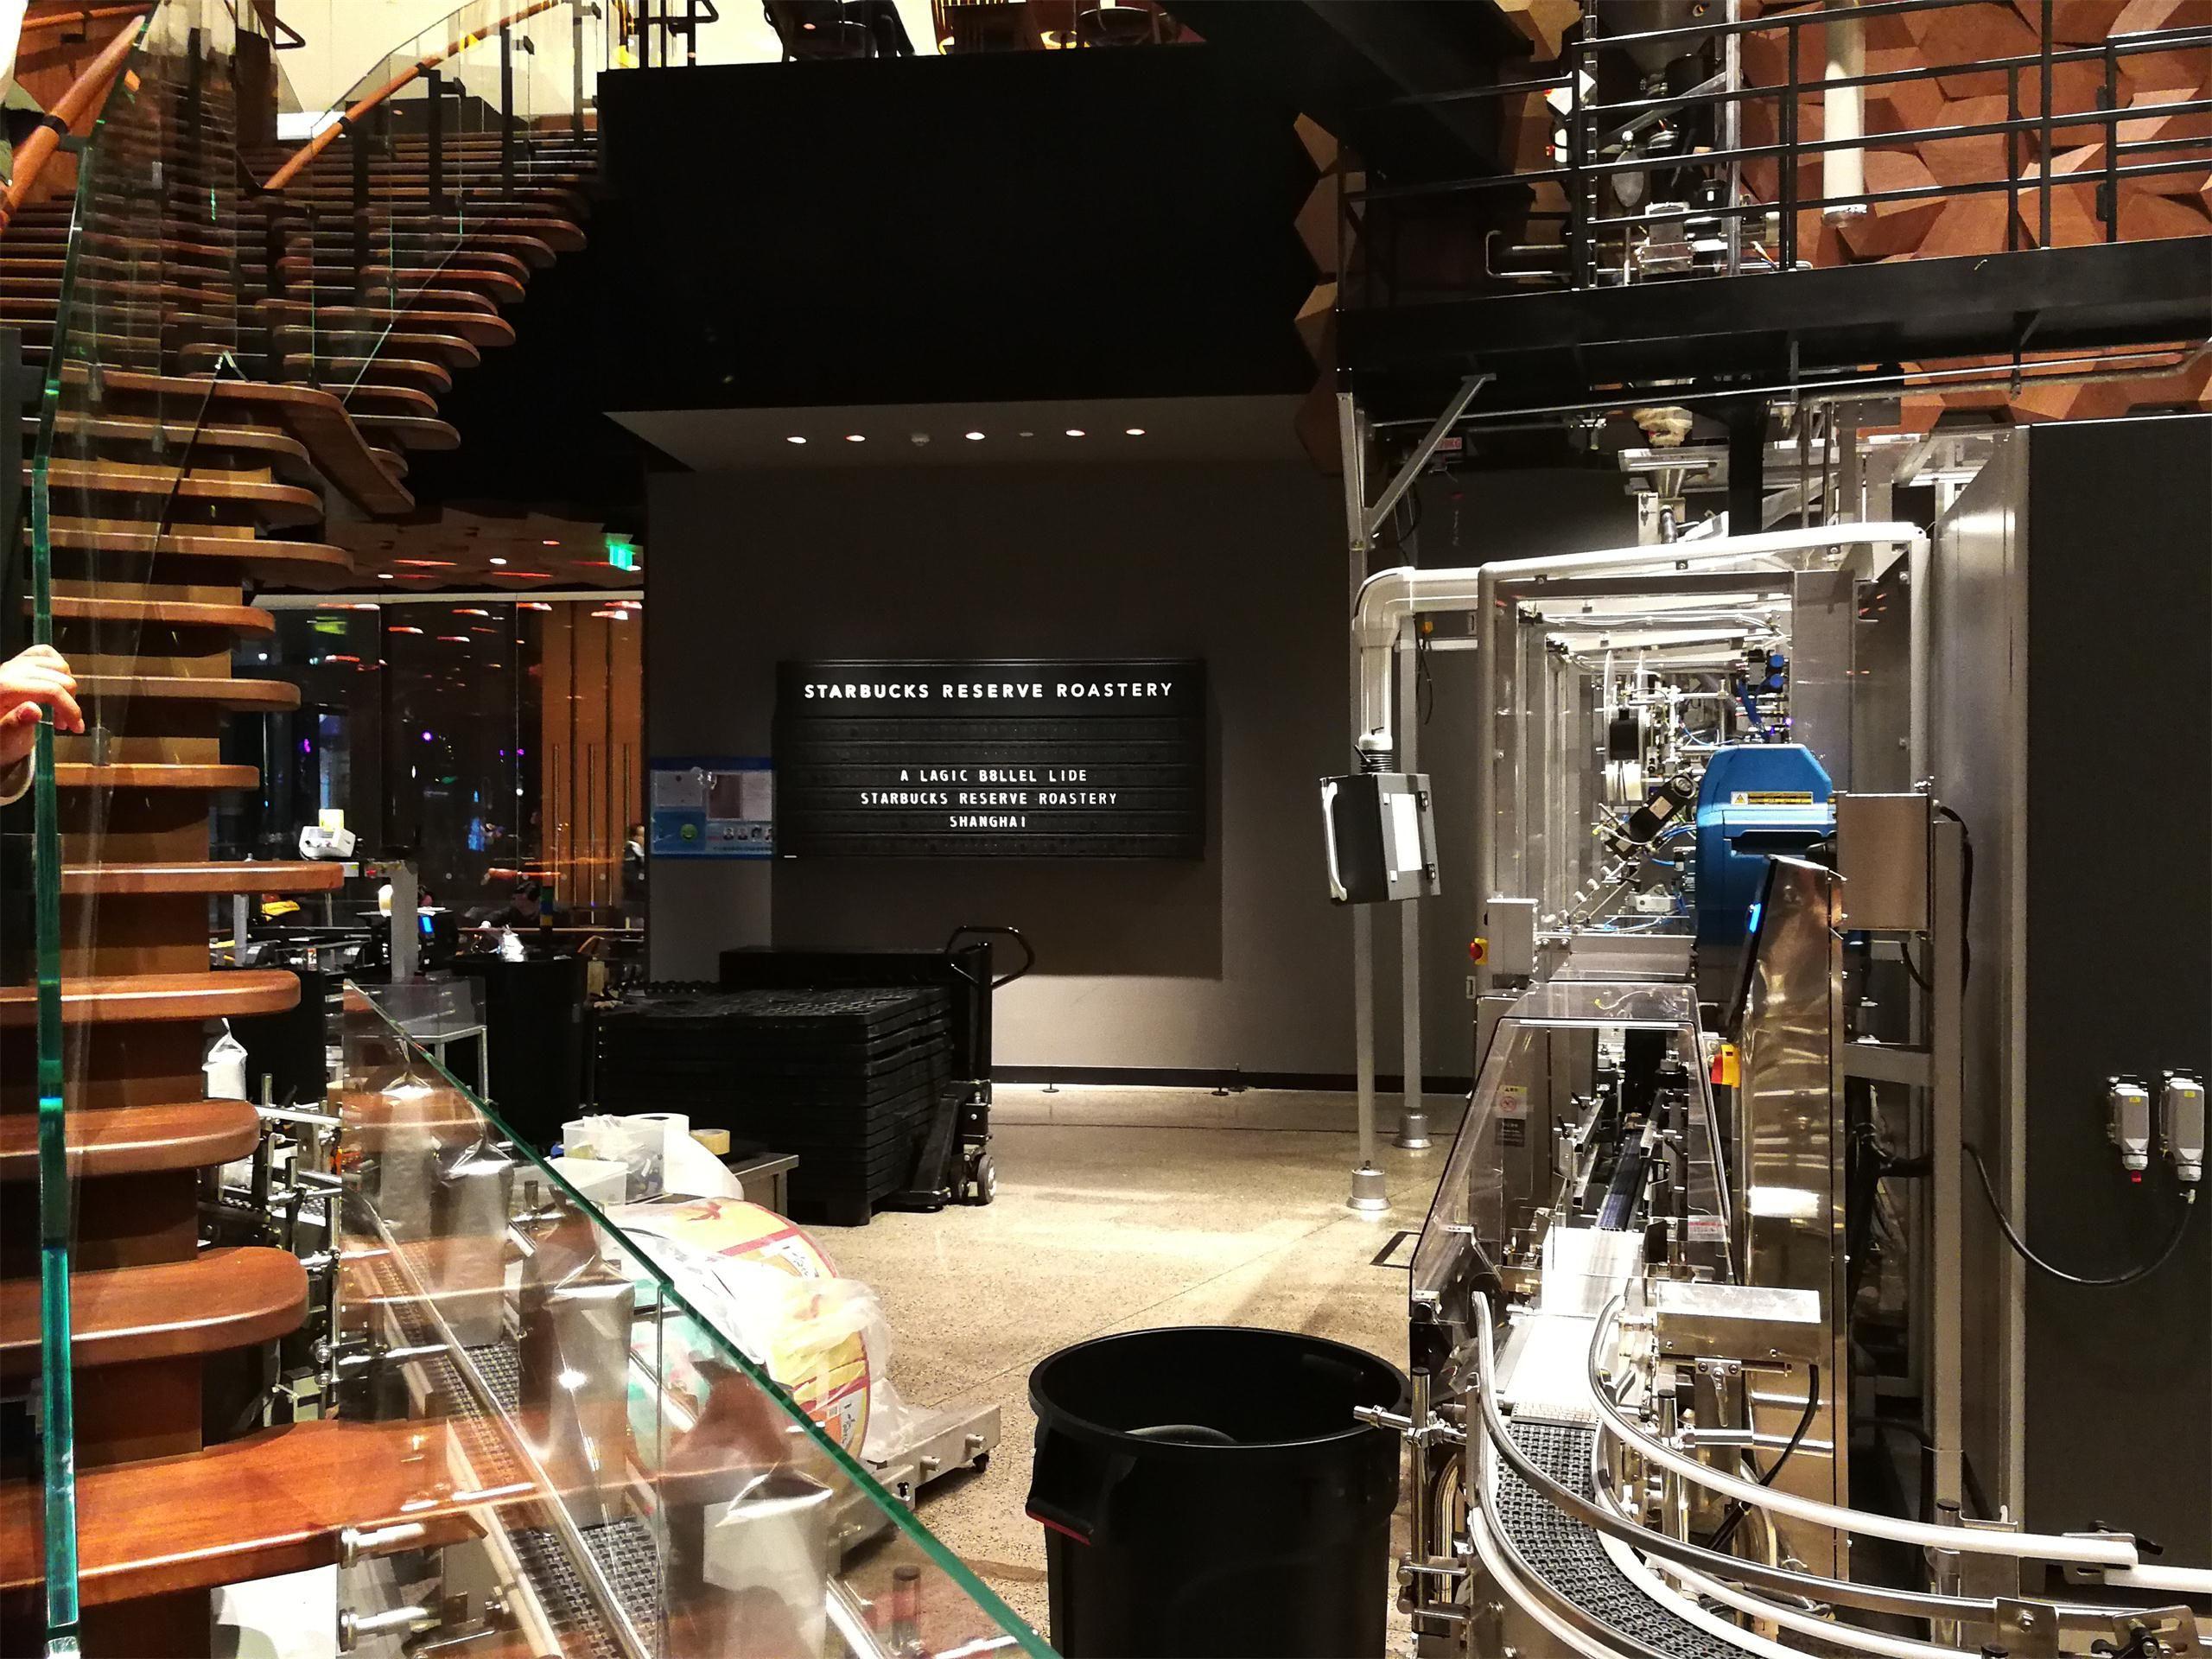 Pin by Neal Caffriy on photo of shanghai Starbucks flagship